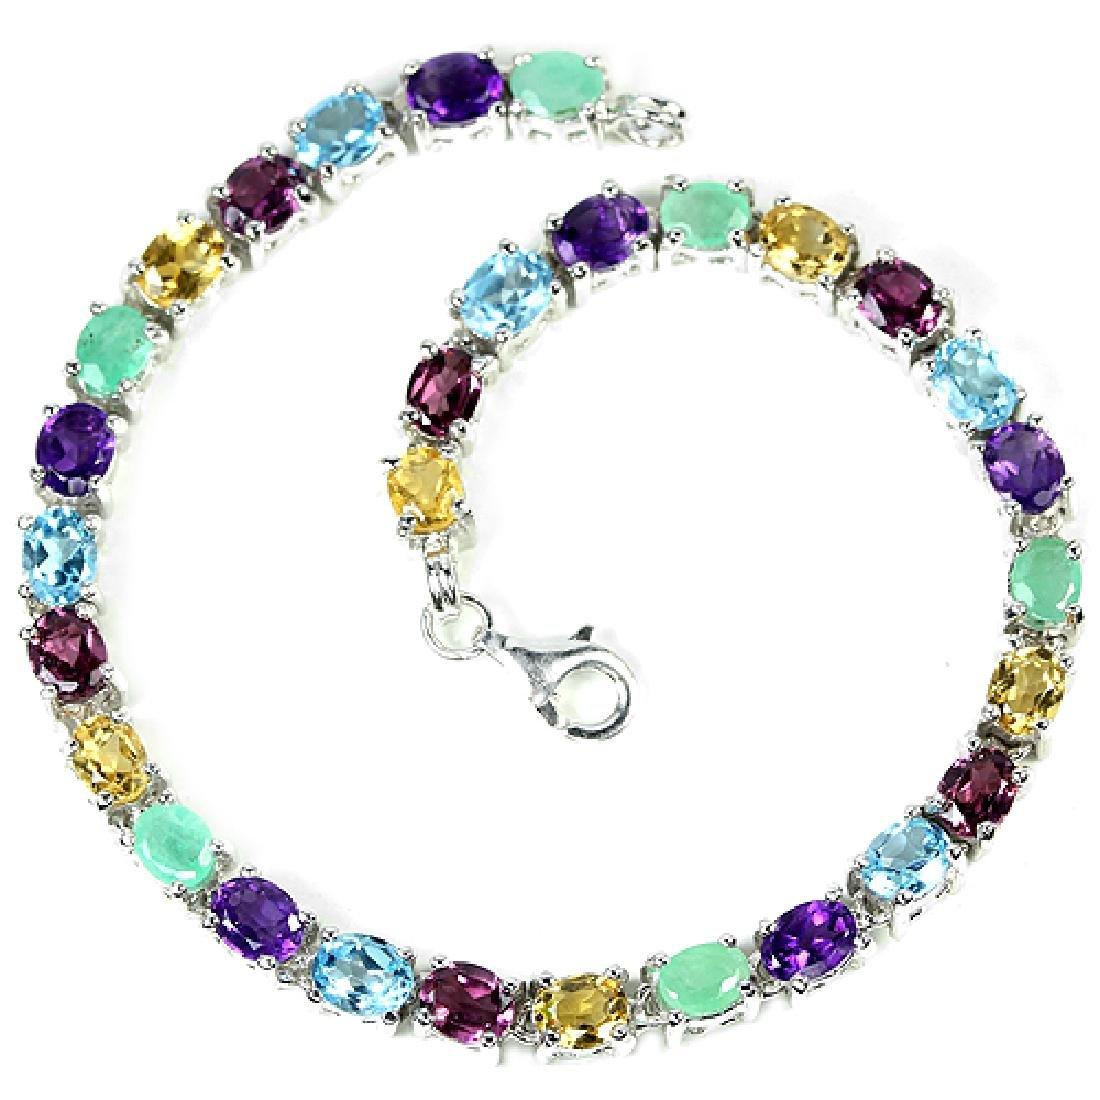 Natural EMERALD TOPAZ RHODOLITE AMETHYST Bracelet